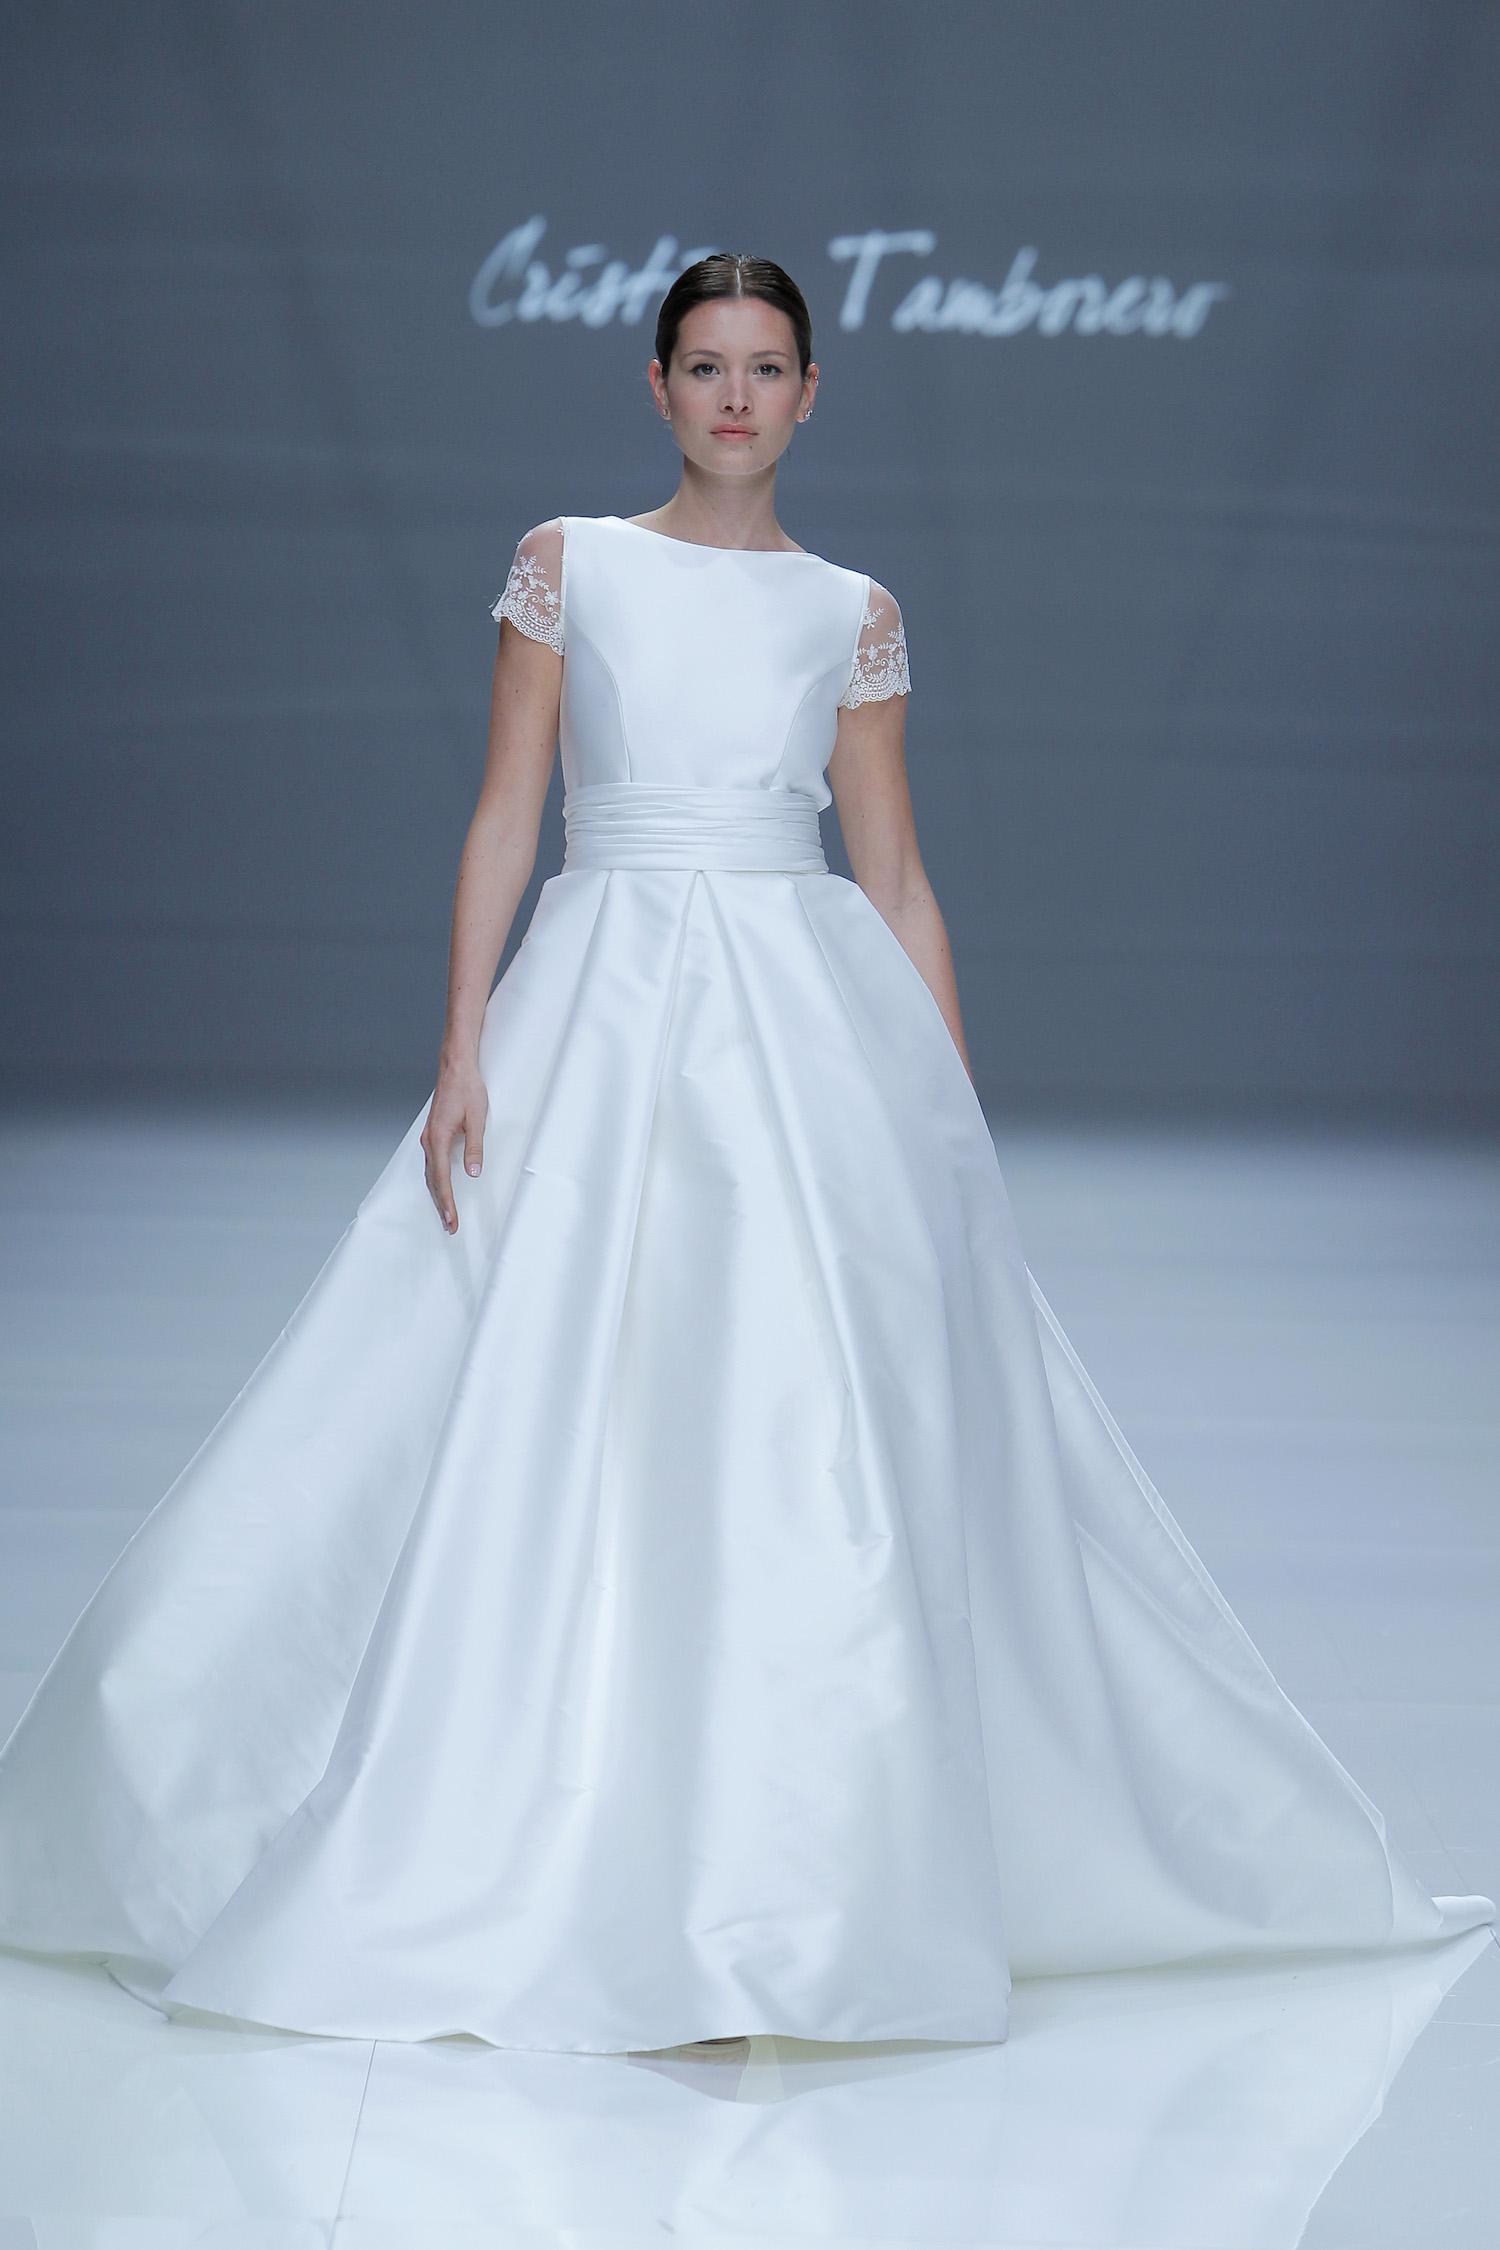 Luxury Marca De Vestidos De Novia Photo - All Wedding Dresses ...